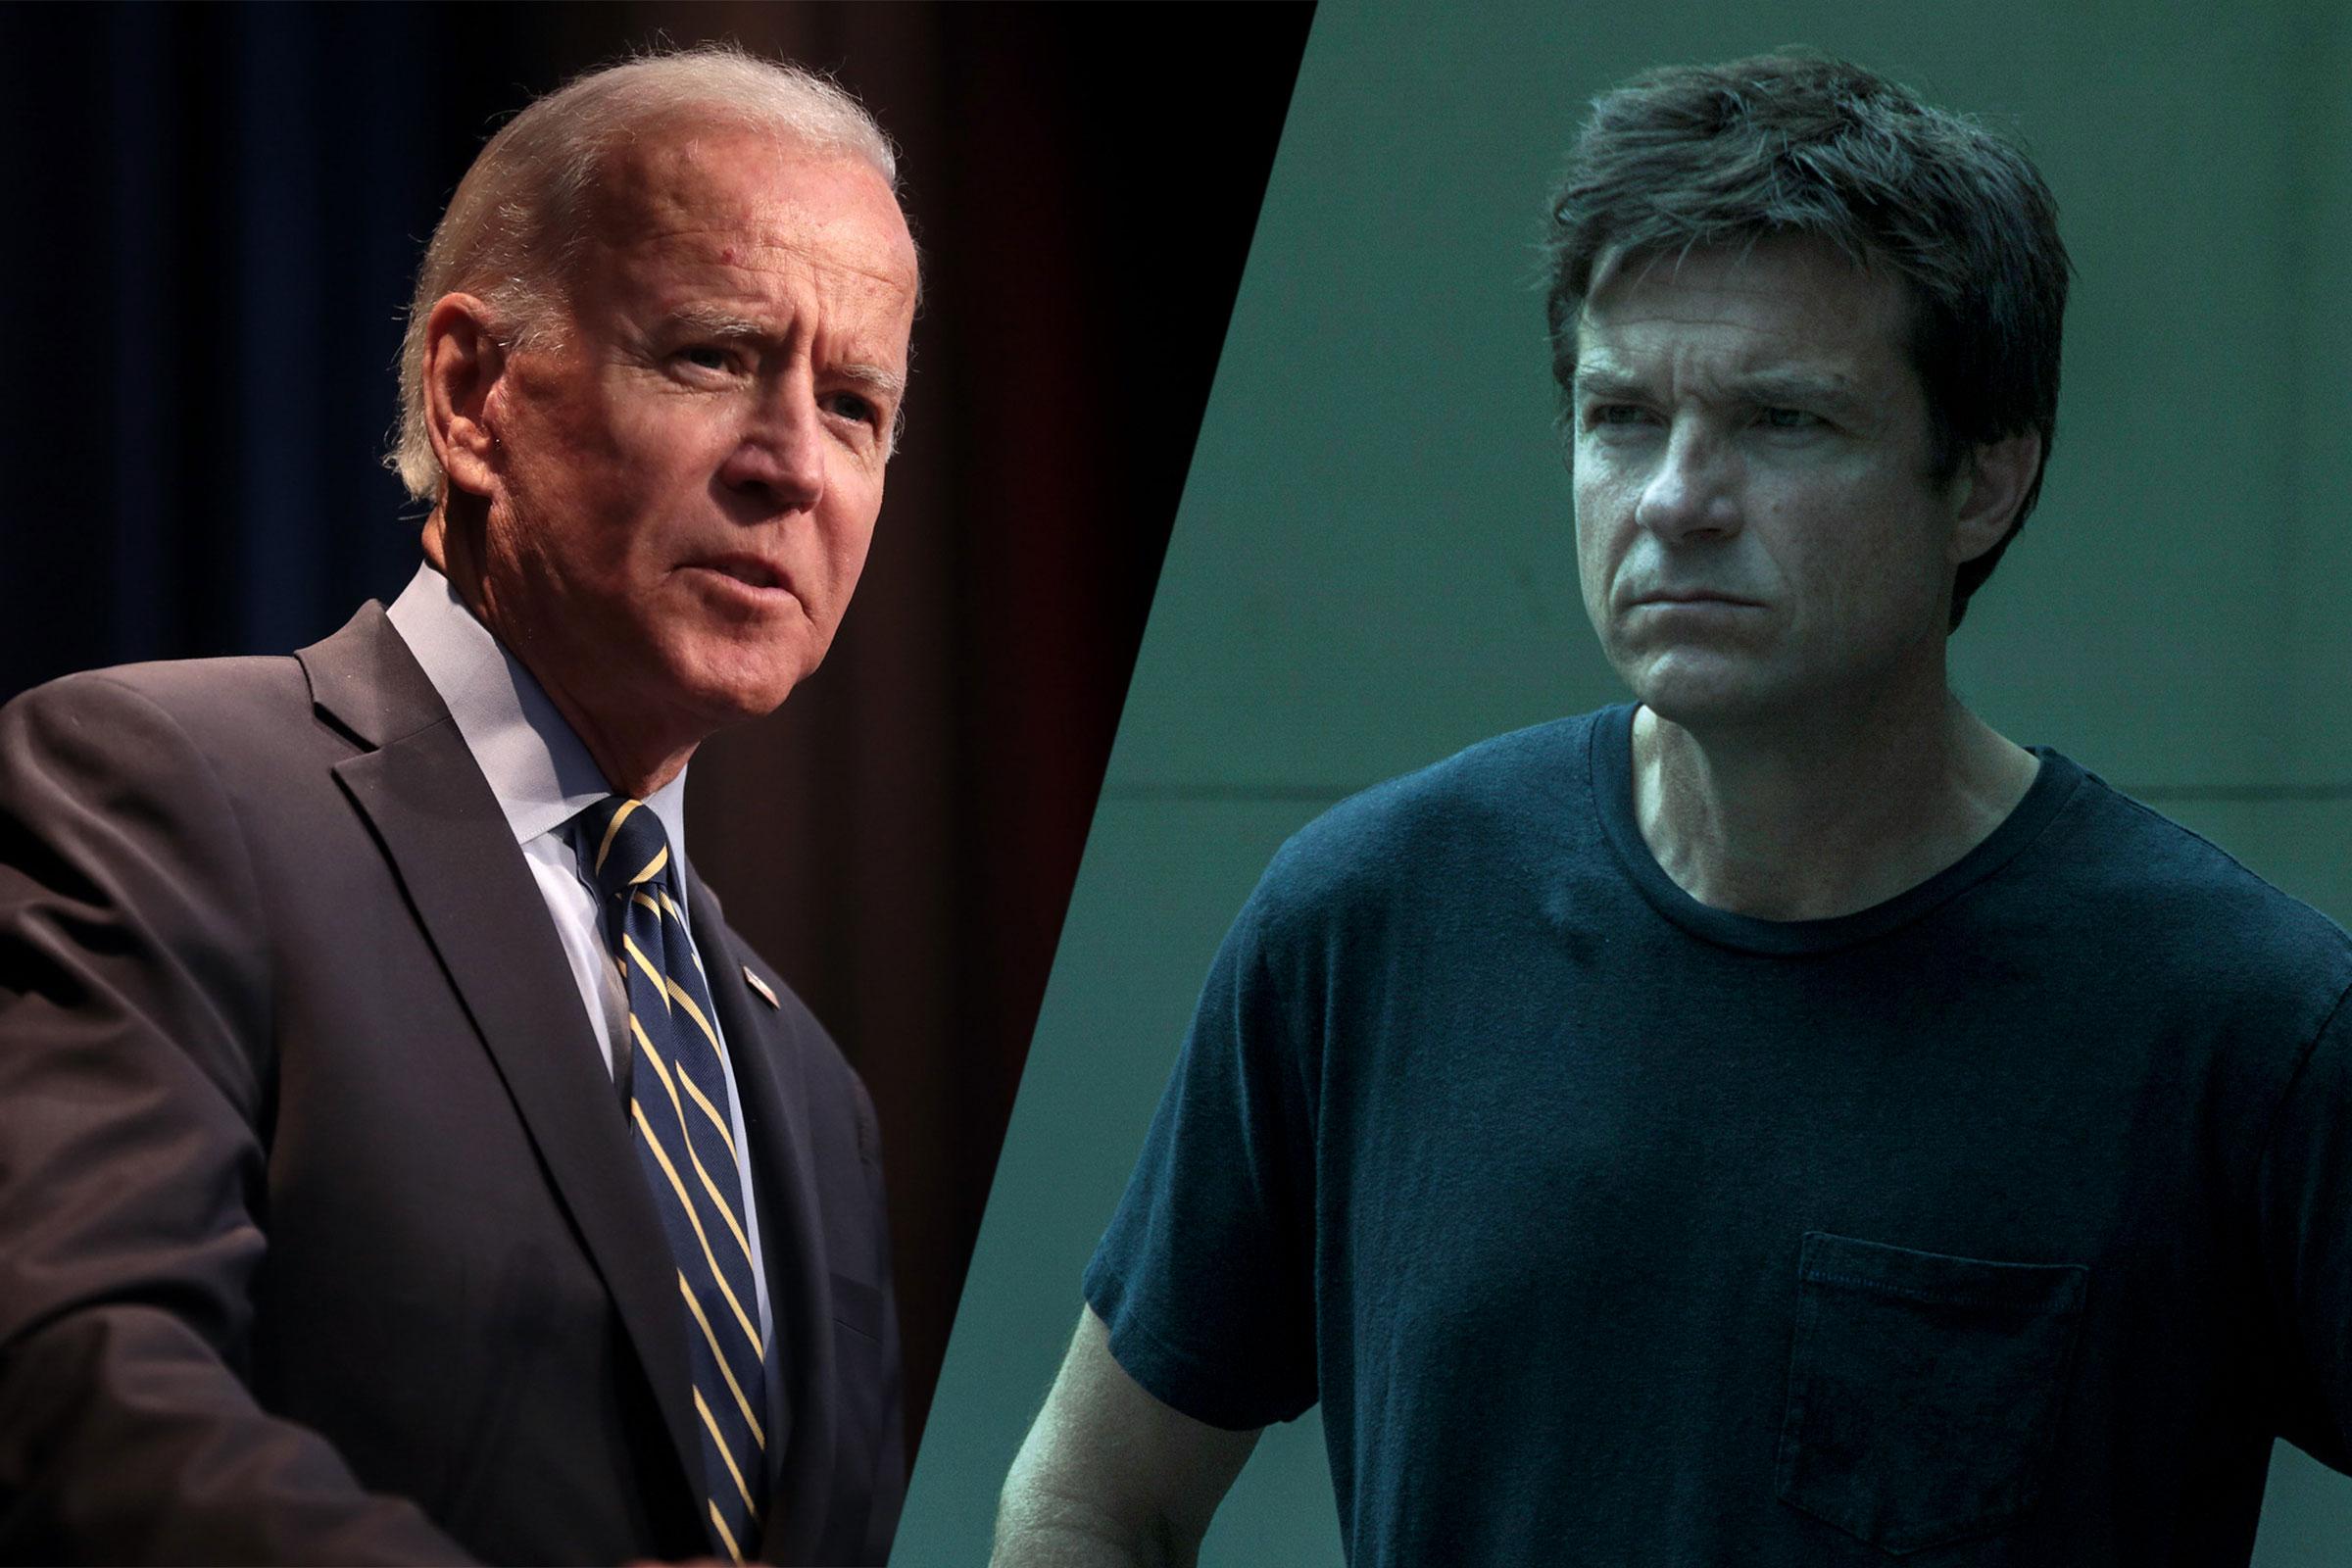 Joe Biden, a white man with short, white hair, stands next to Jason Bateman, a white man portraying Marty Byrde, in Ozark